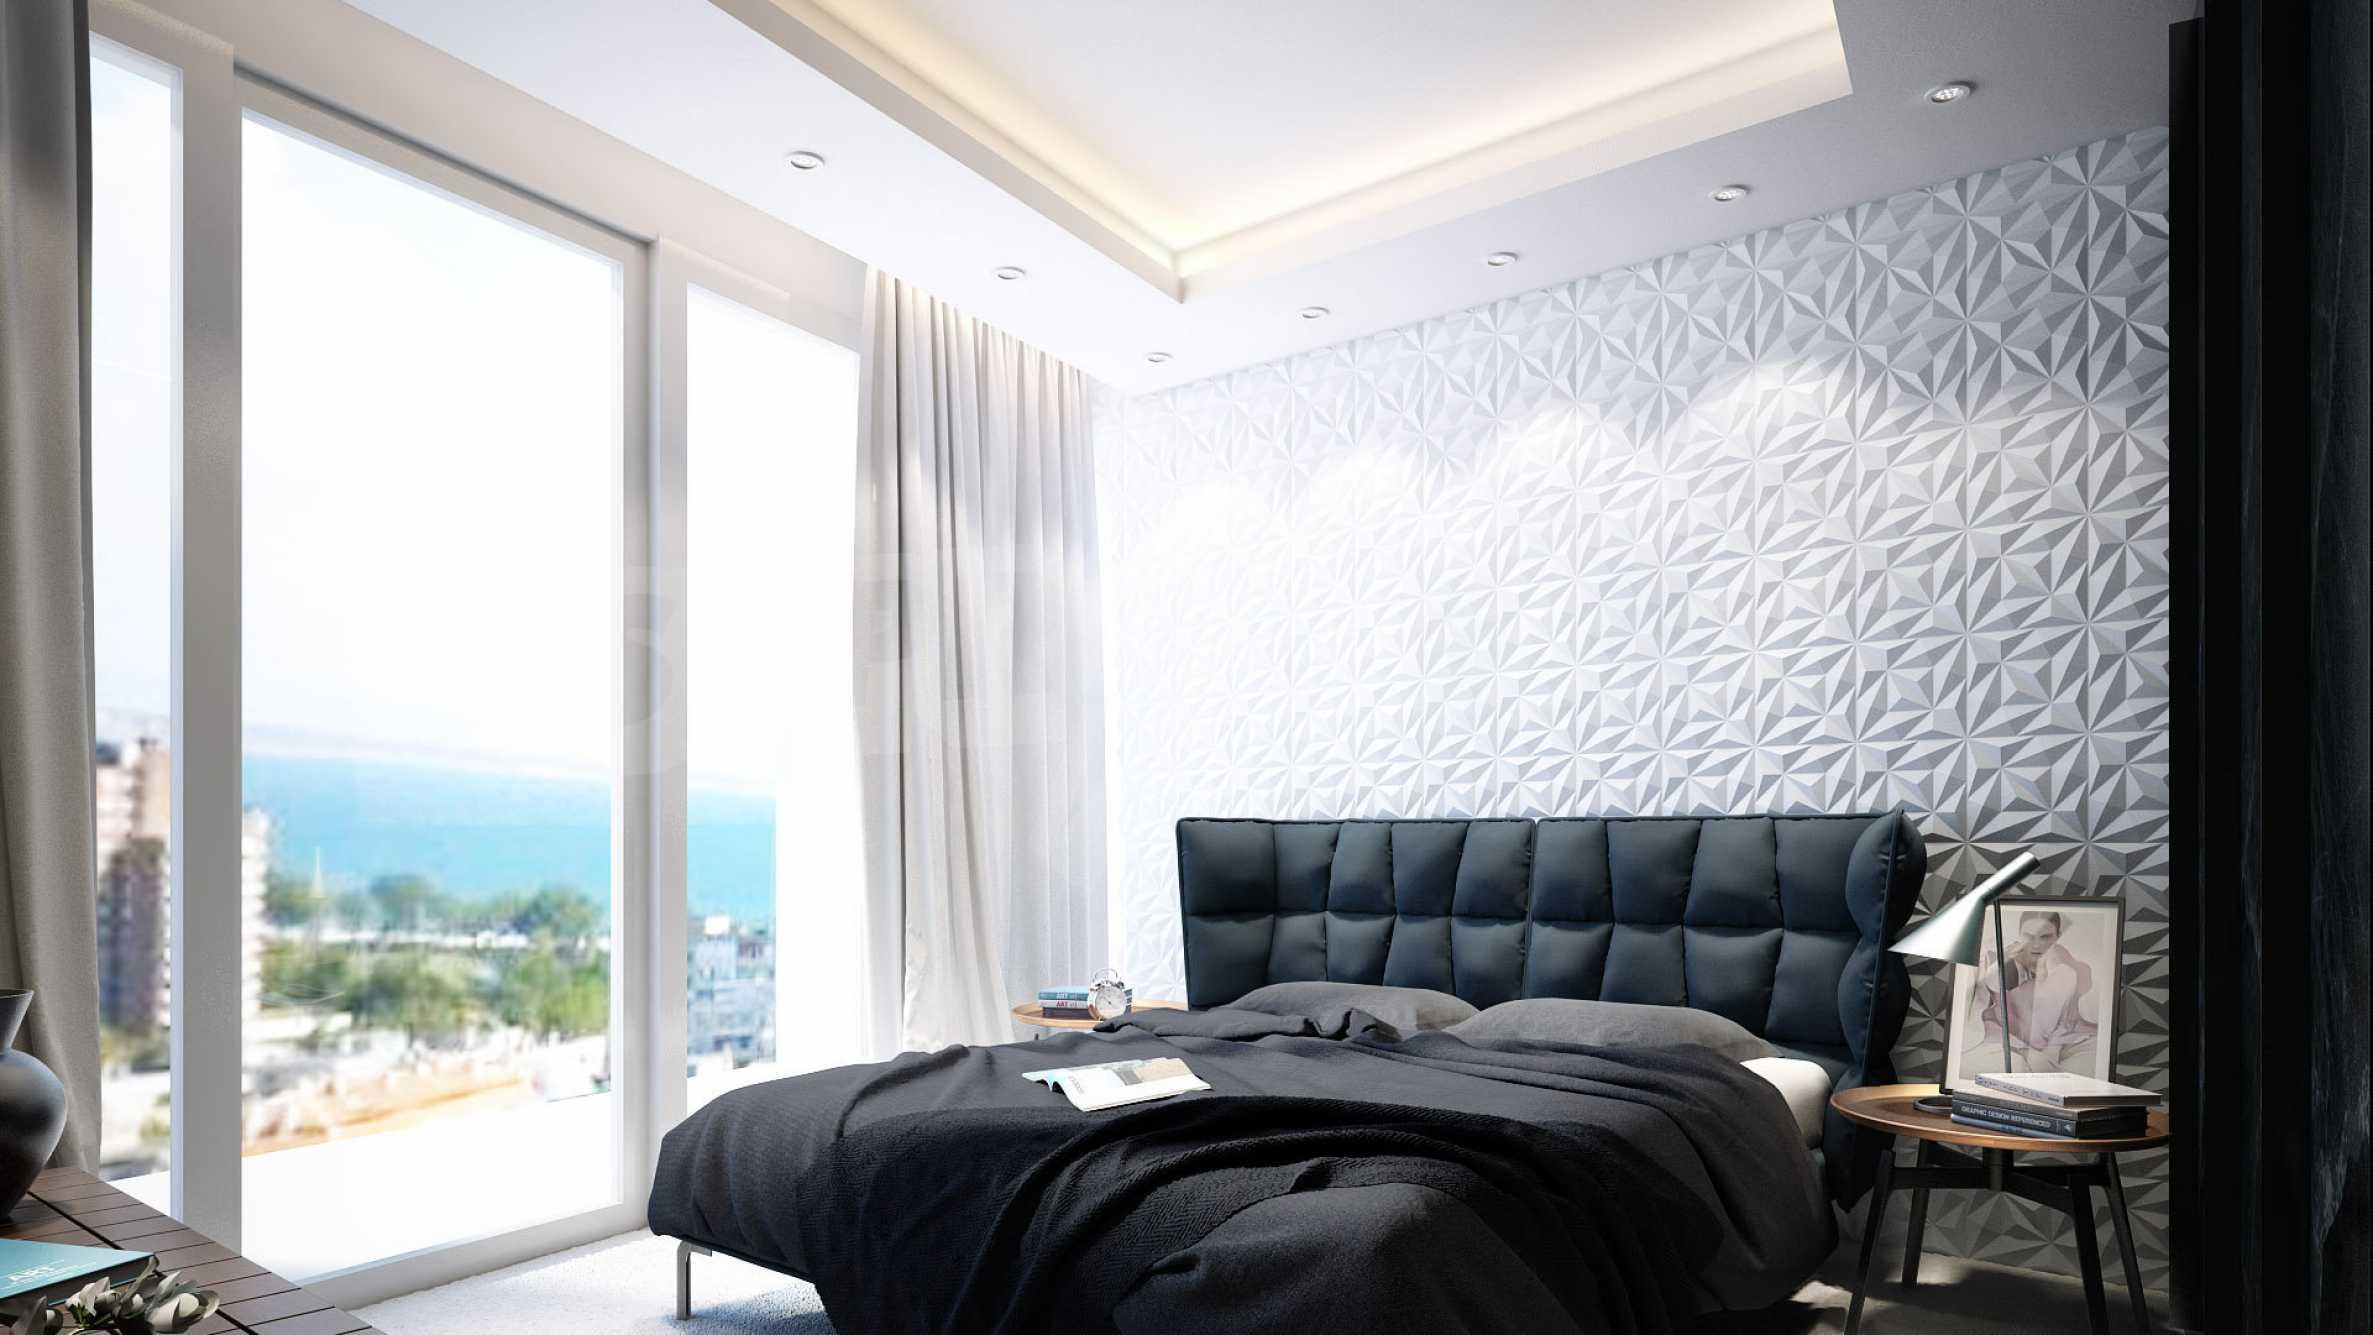 Нова сграда с луксозни апартаменти в гр. Бургас 34